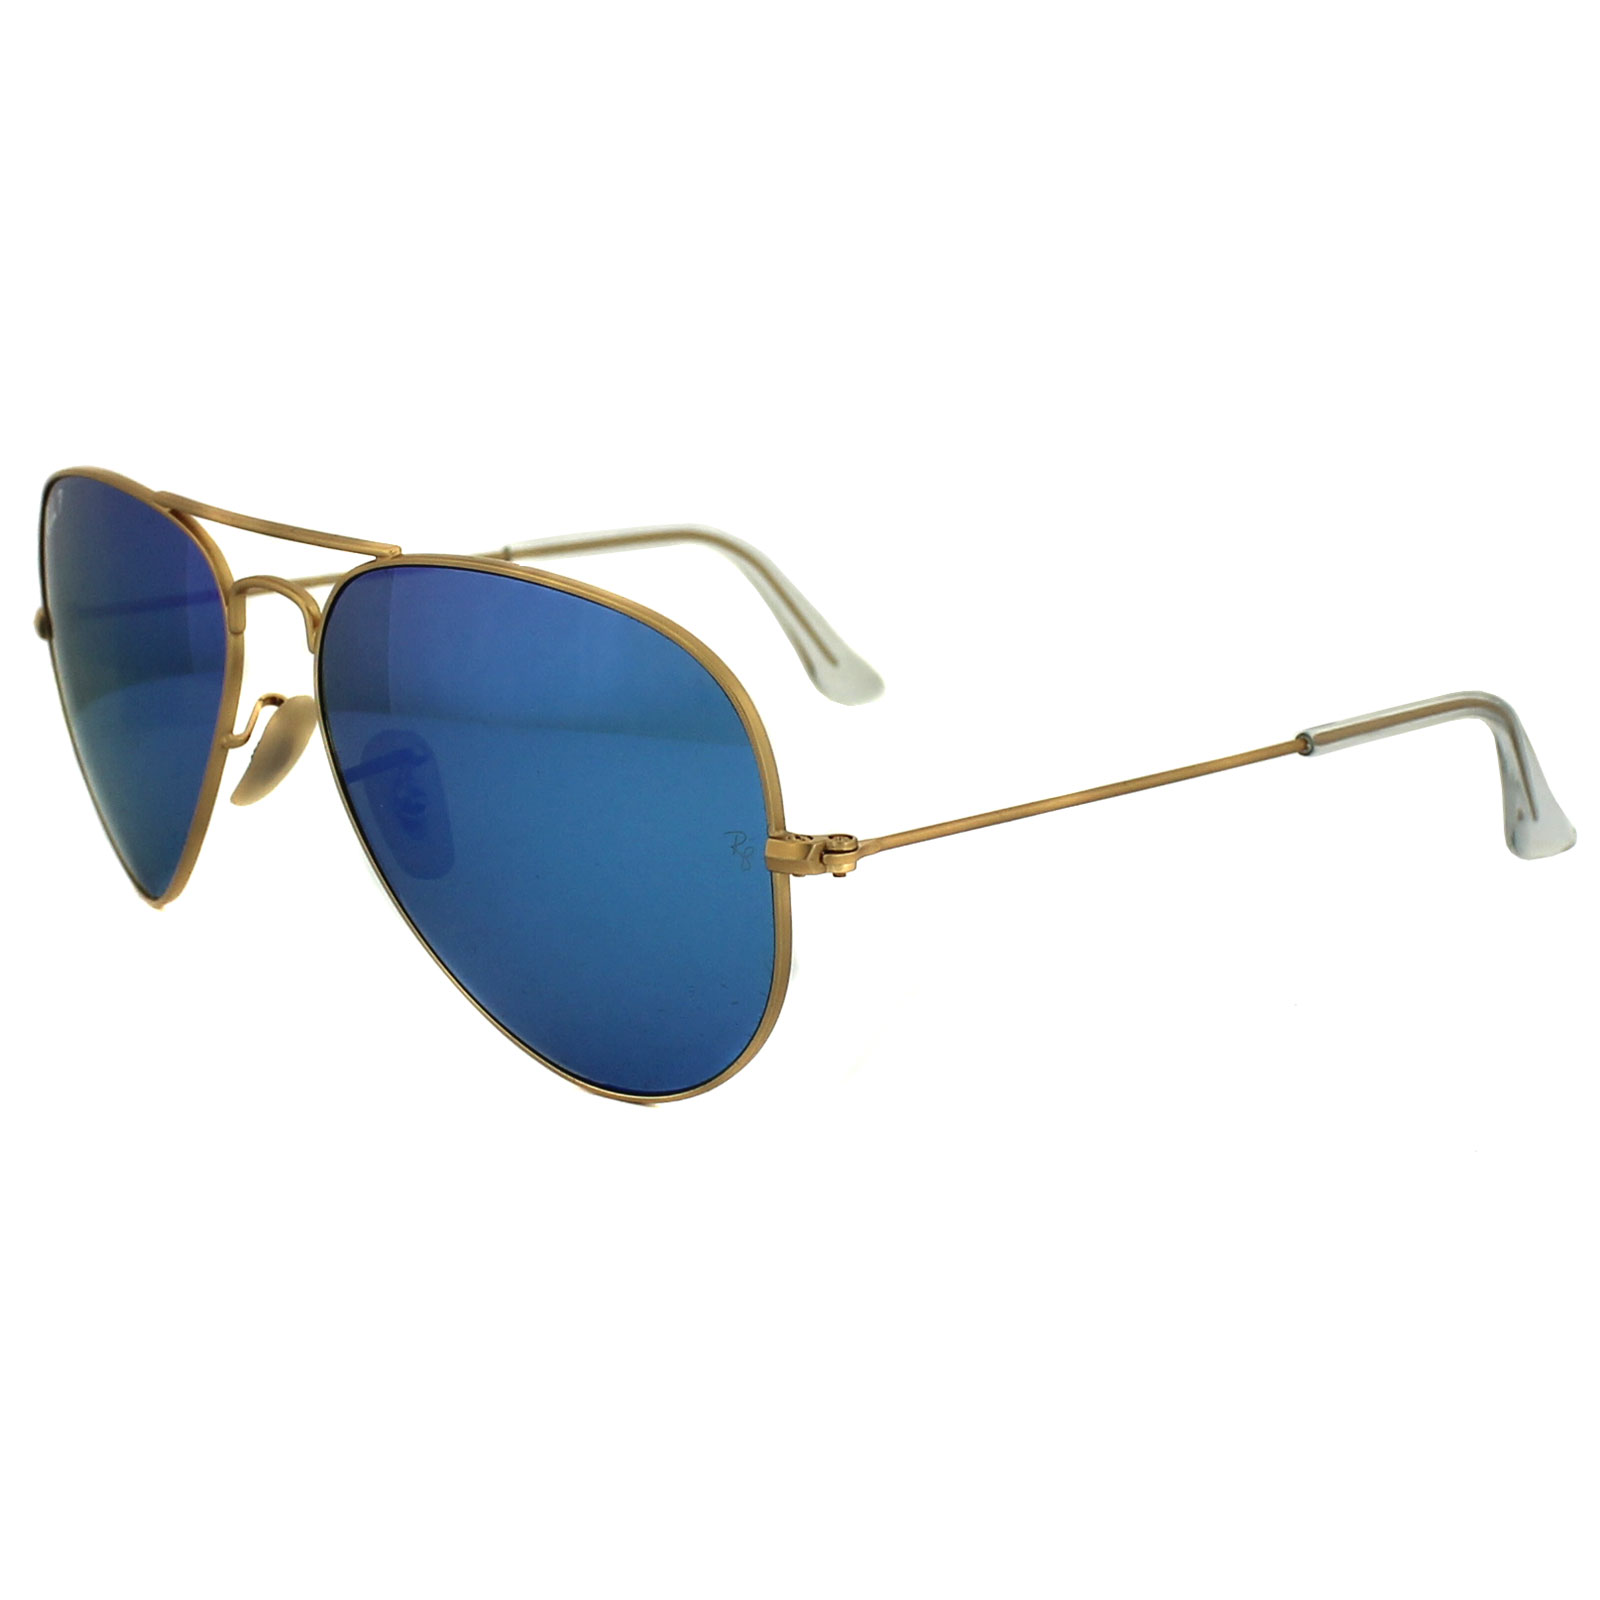 42e9c6025 CENTINELA Gafas de sol de Ray-Ban aviador 3025 112 / 4L espejo azul oro mate